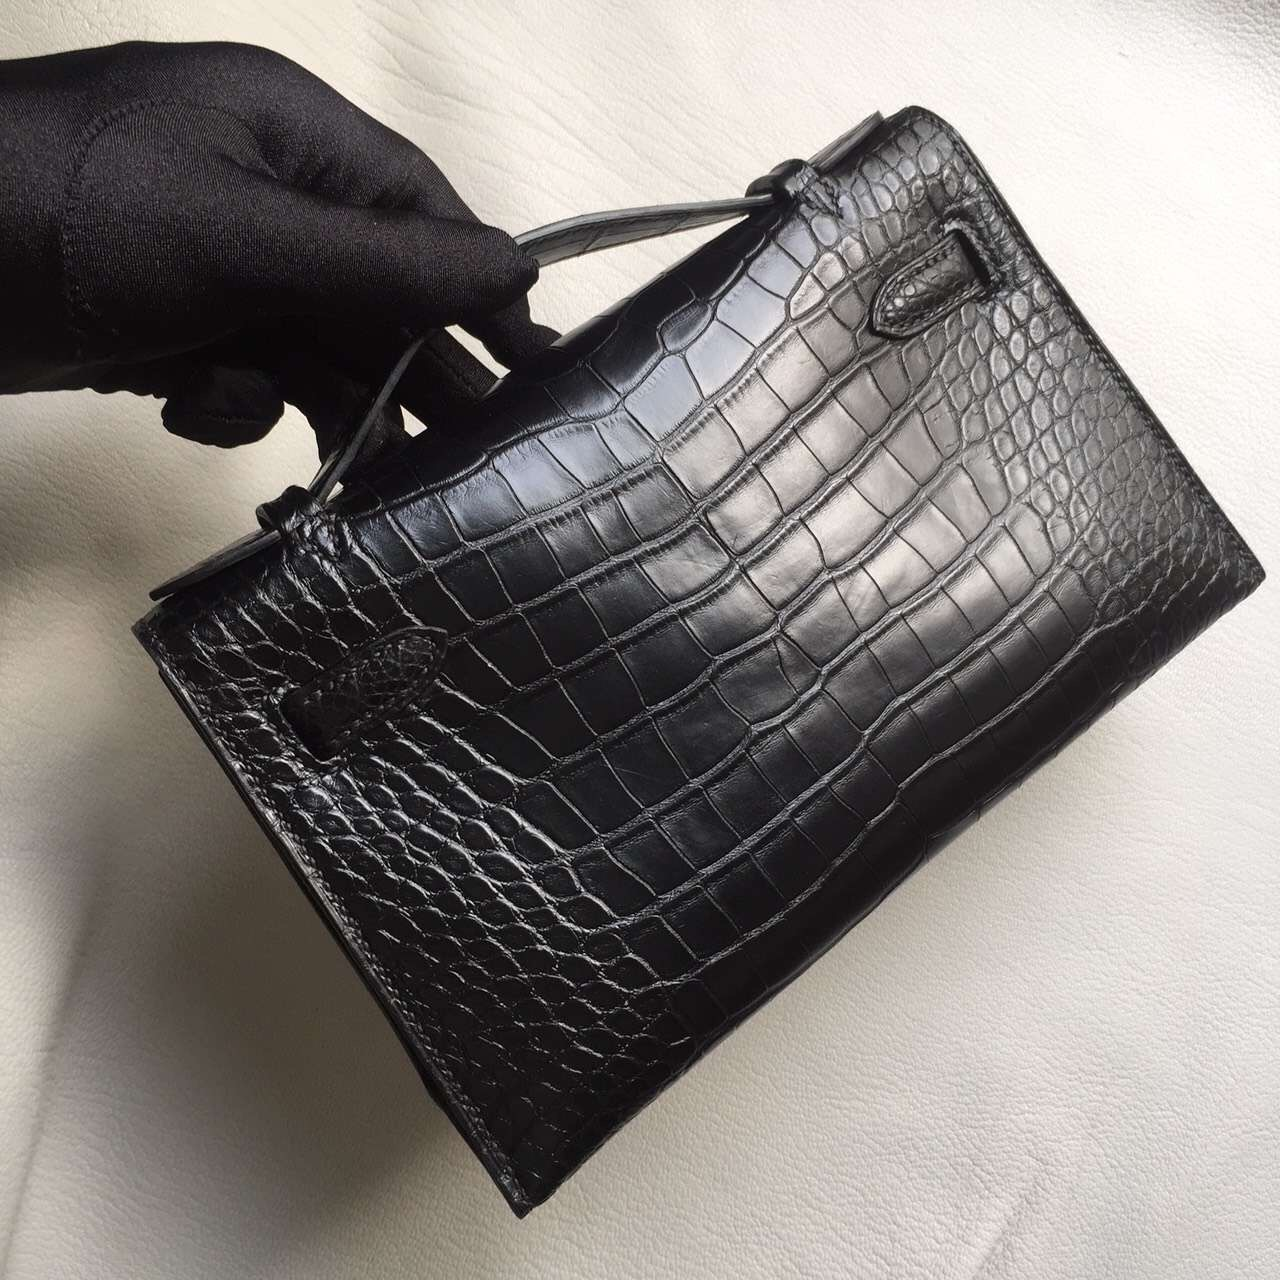 Discount Hermes Crocodile Matt Leather Mini Kelly Clutch Bag in CK89 Black